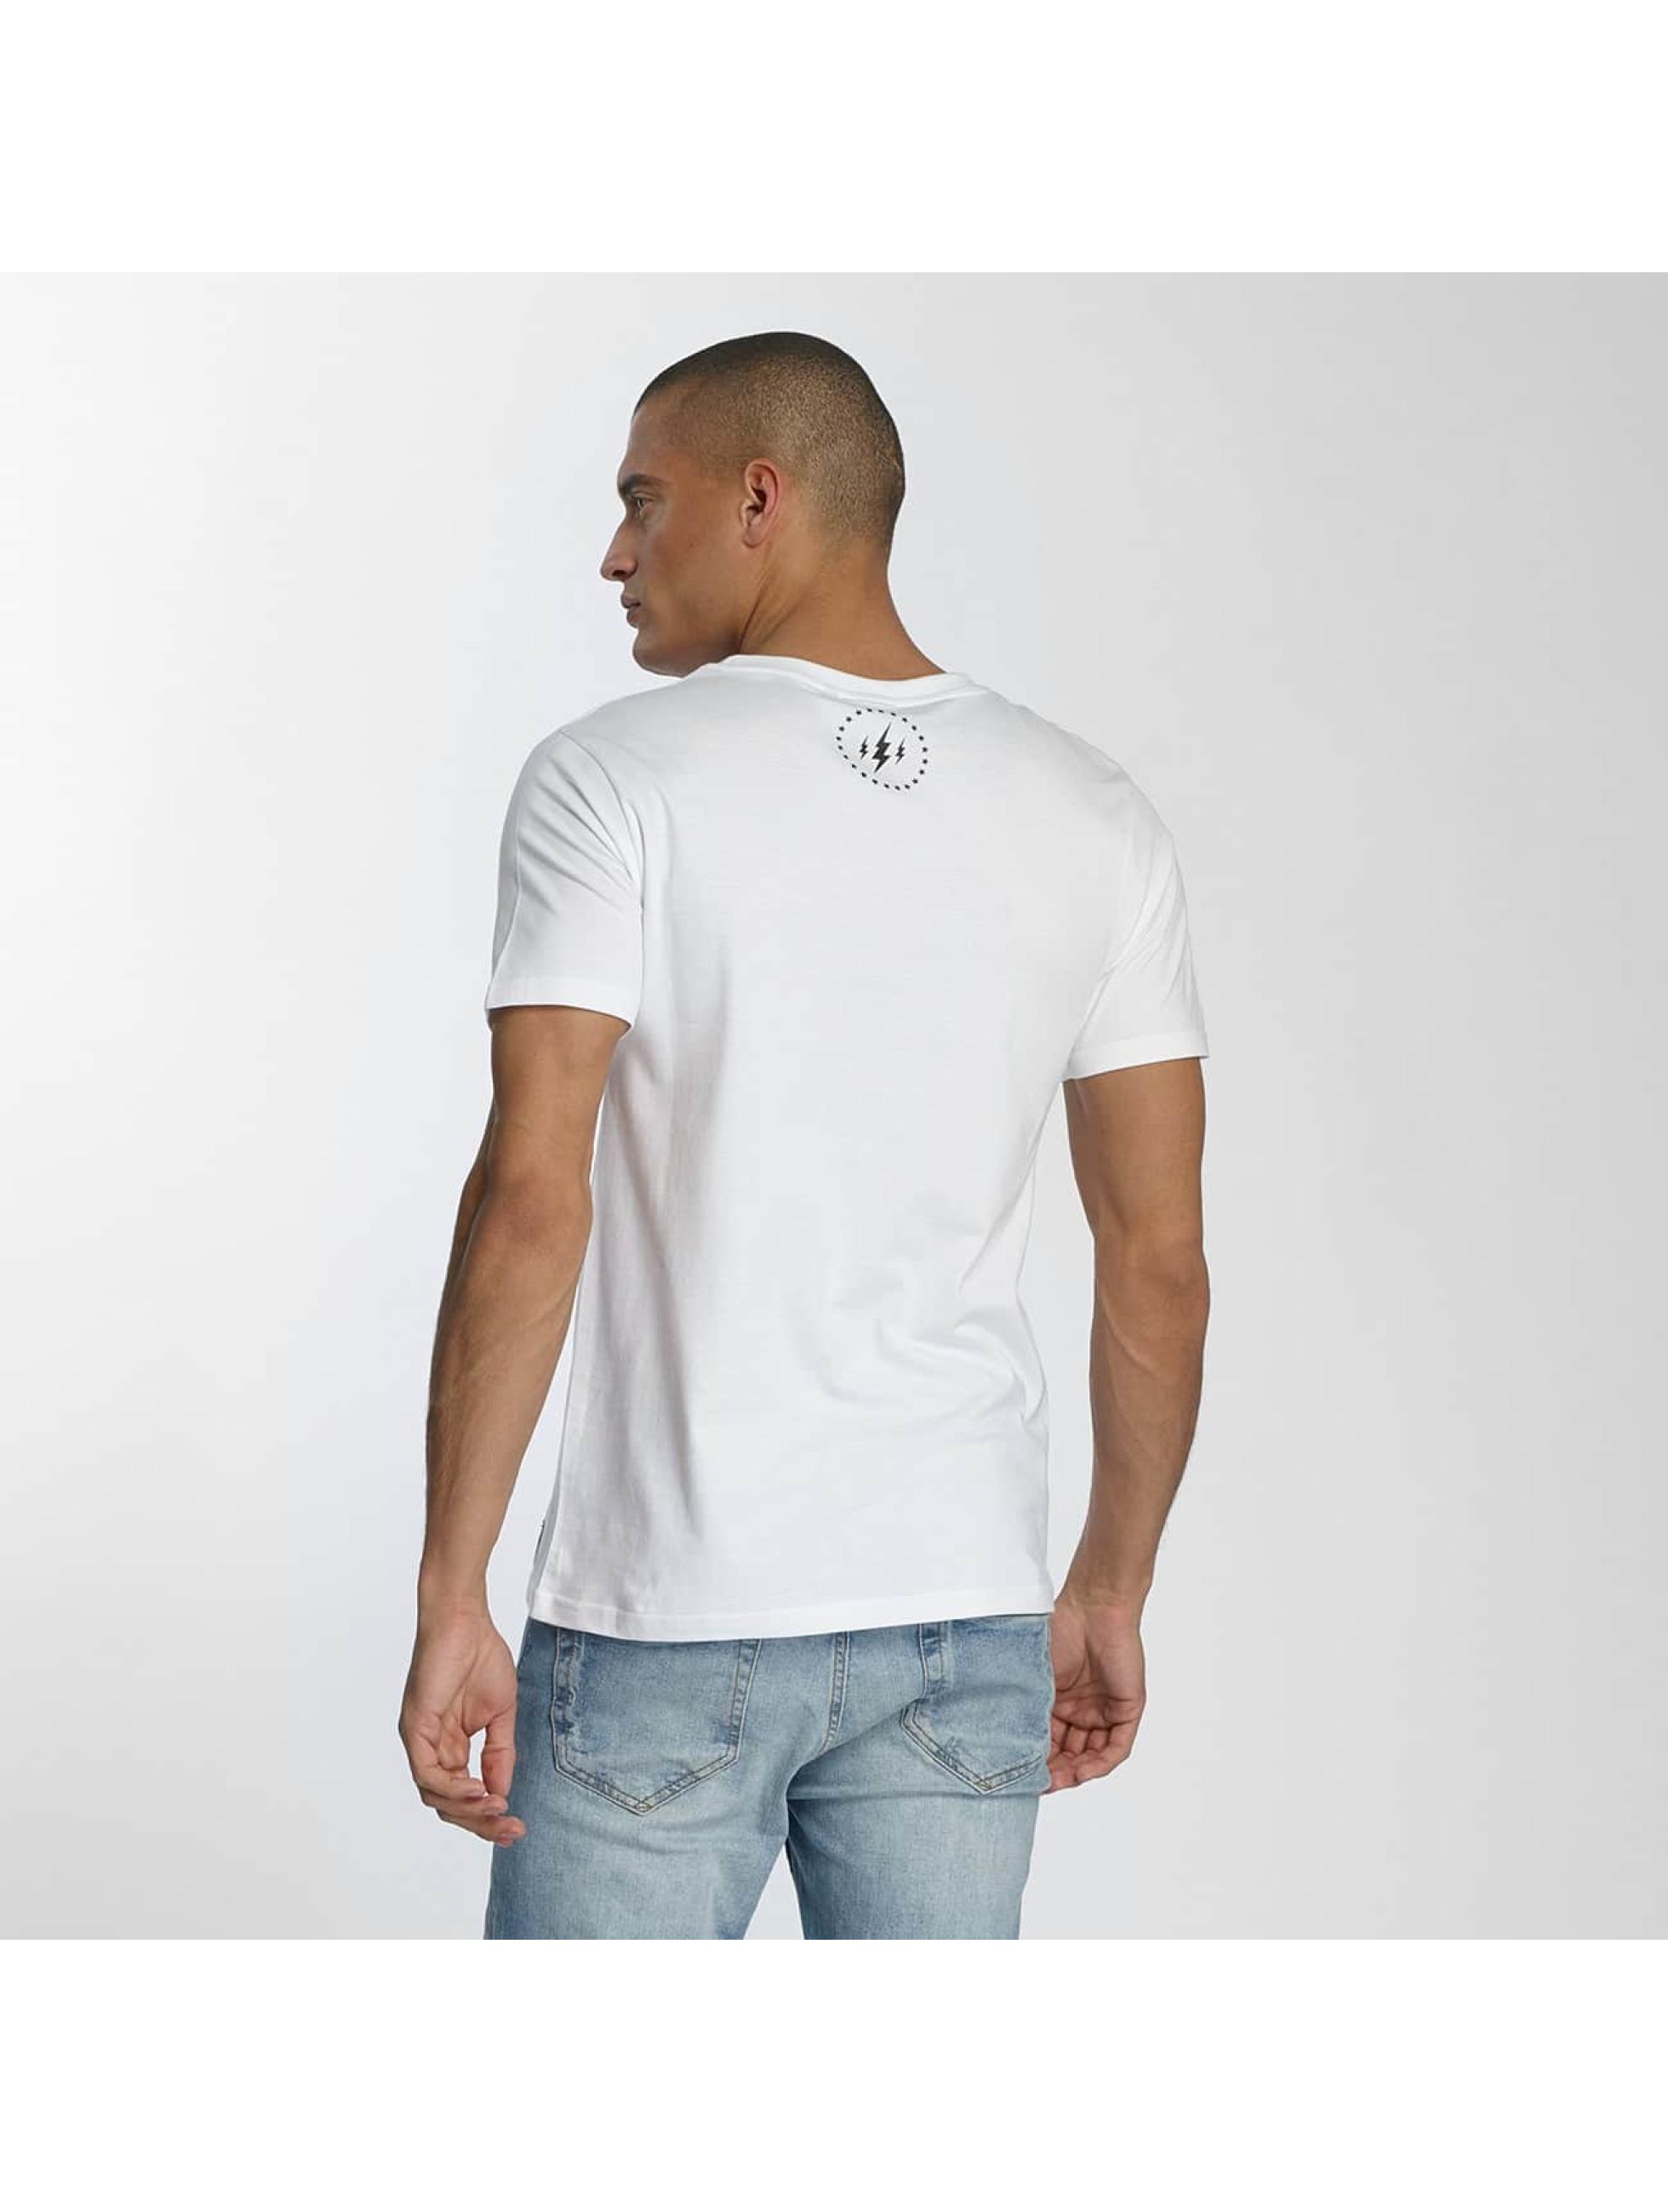 TrueSpin t-shirt 1 wit